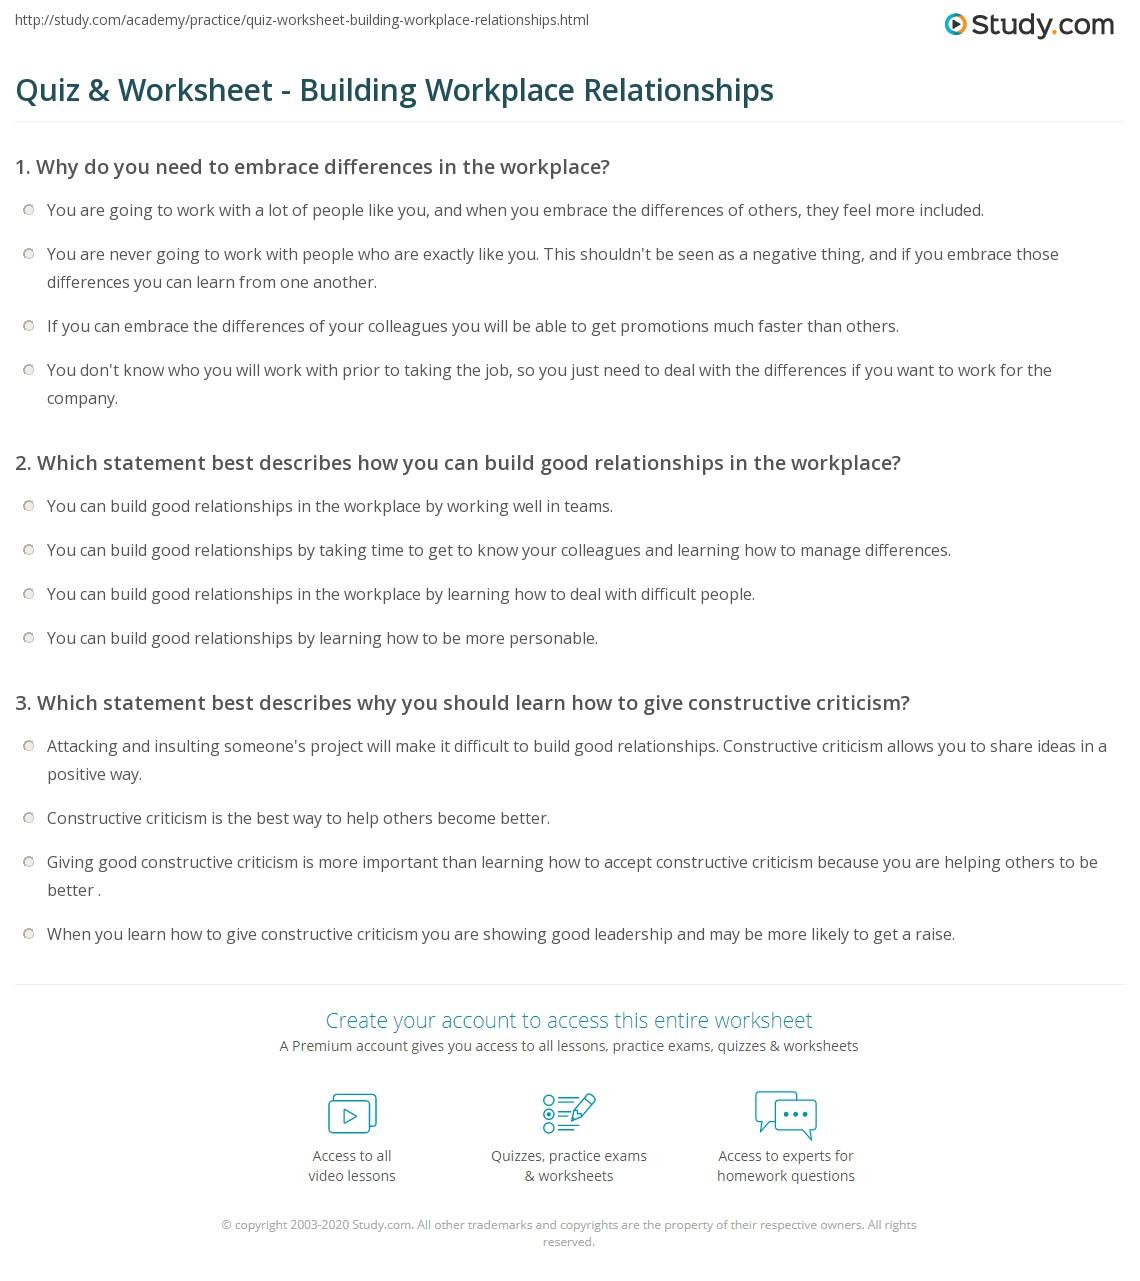 Worksheets Building Healthy Relationships Worksheet quiz worksheet building workplace relationships study com print in the worksheet